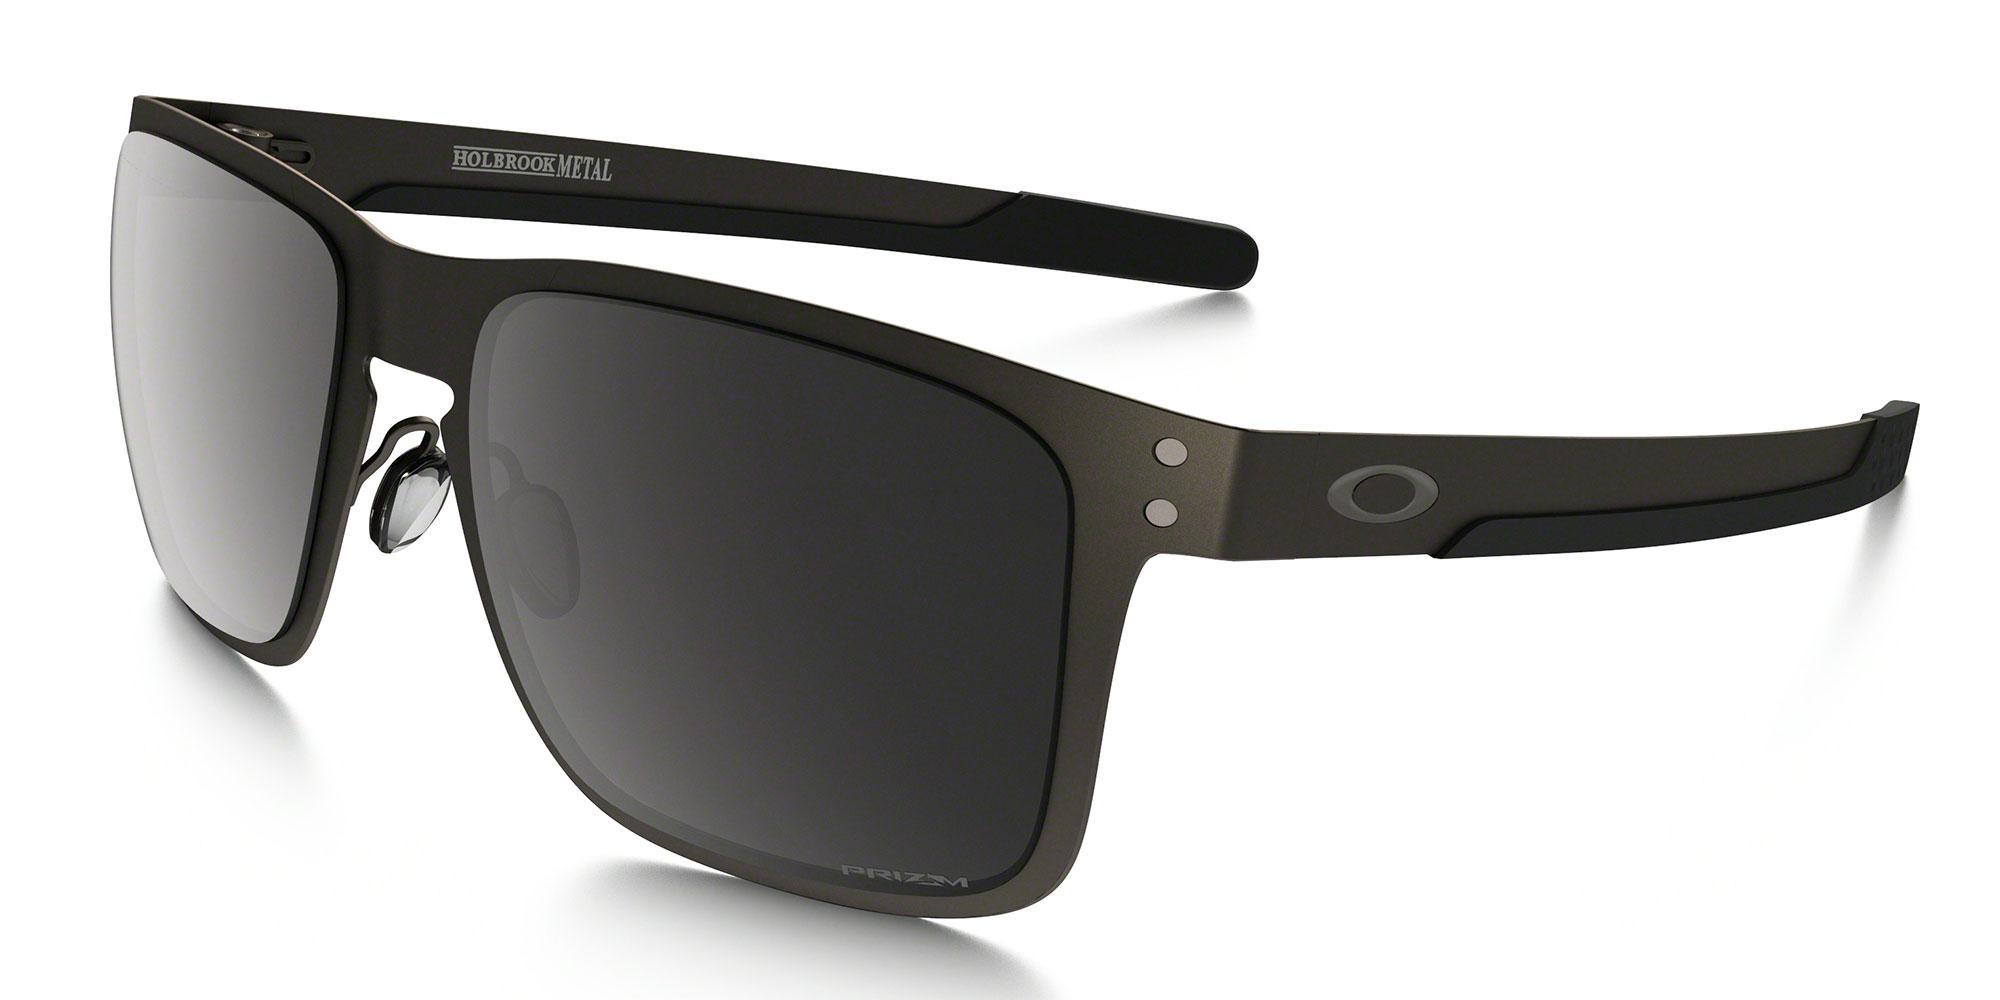 412306 OO4123 HOLBROOK METAL Sunglasses, Oakley